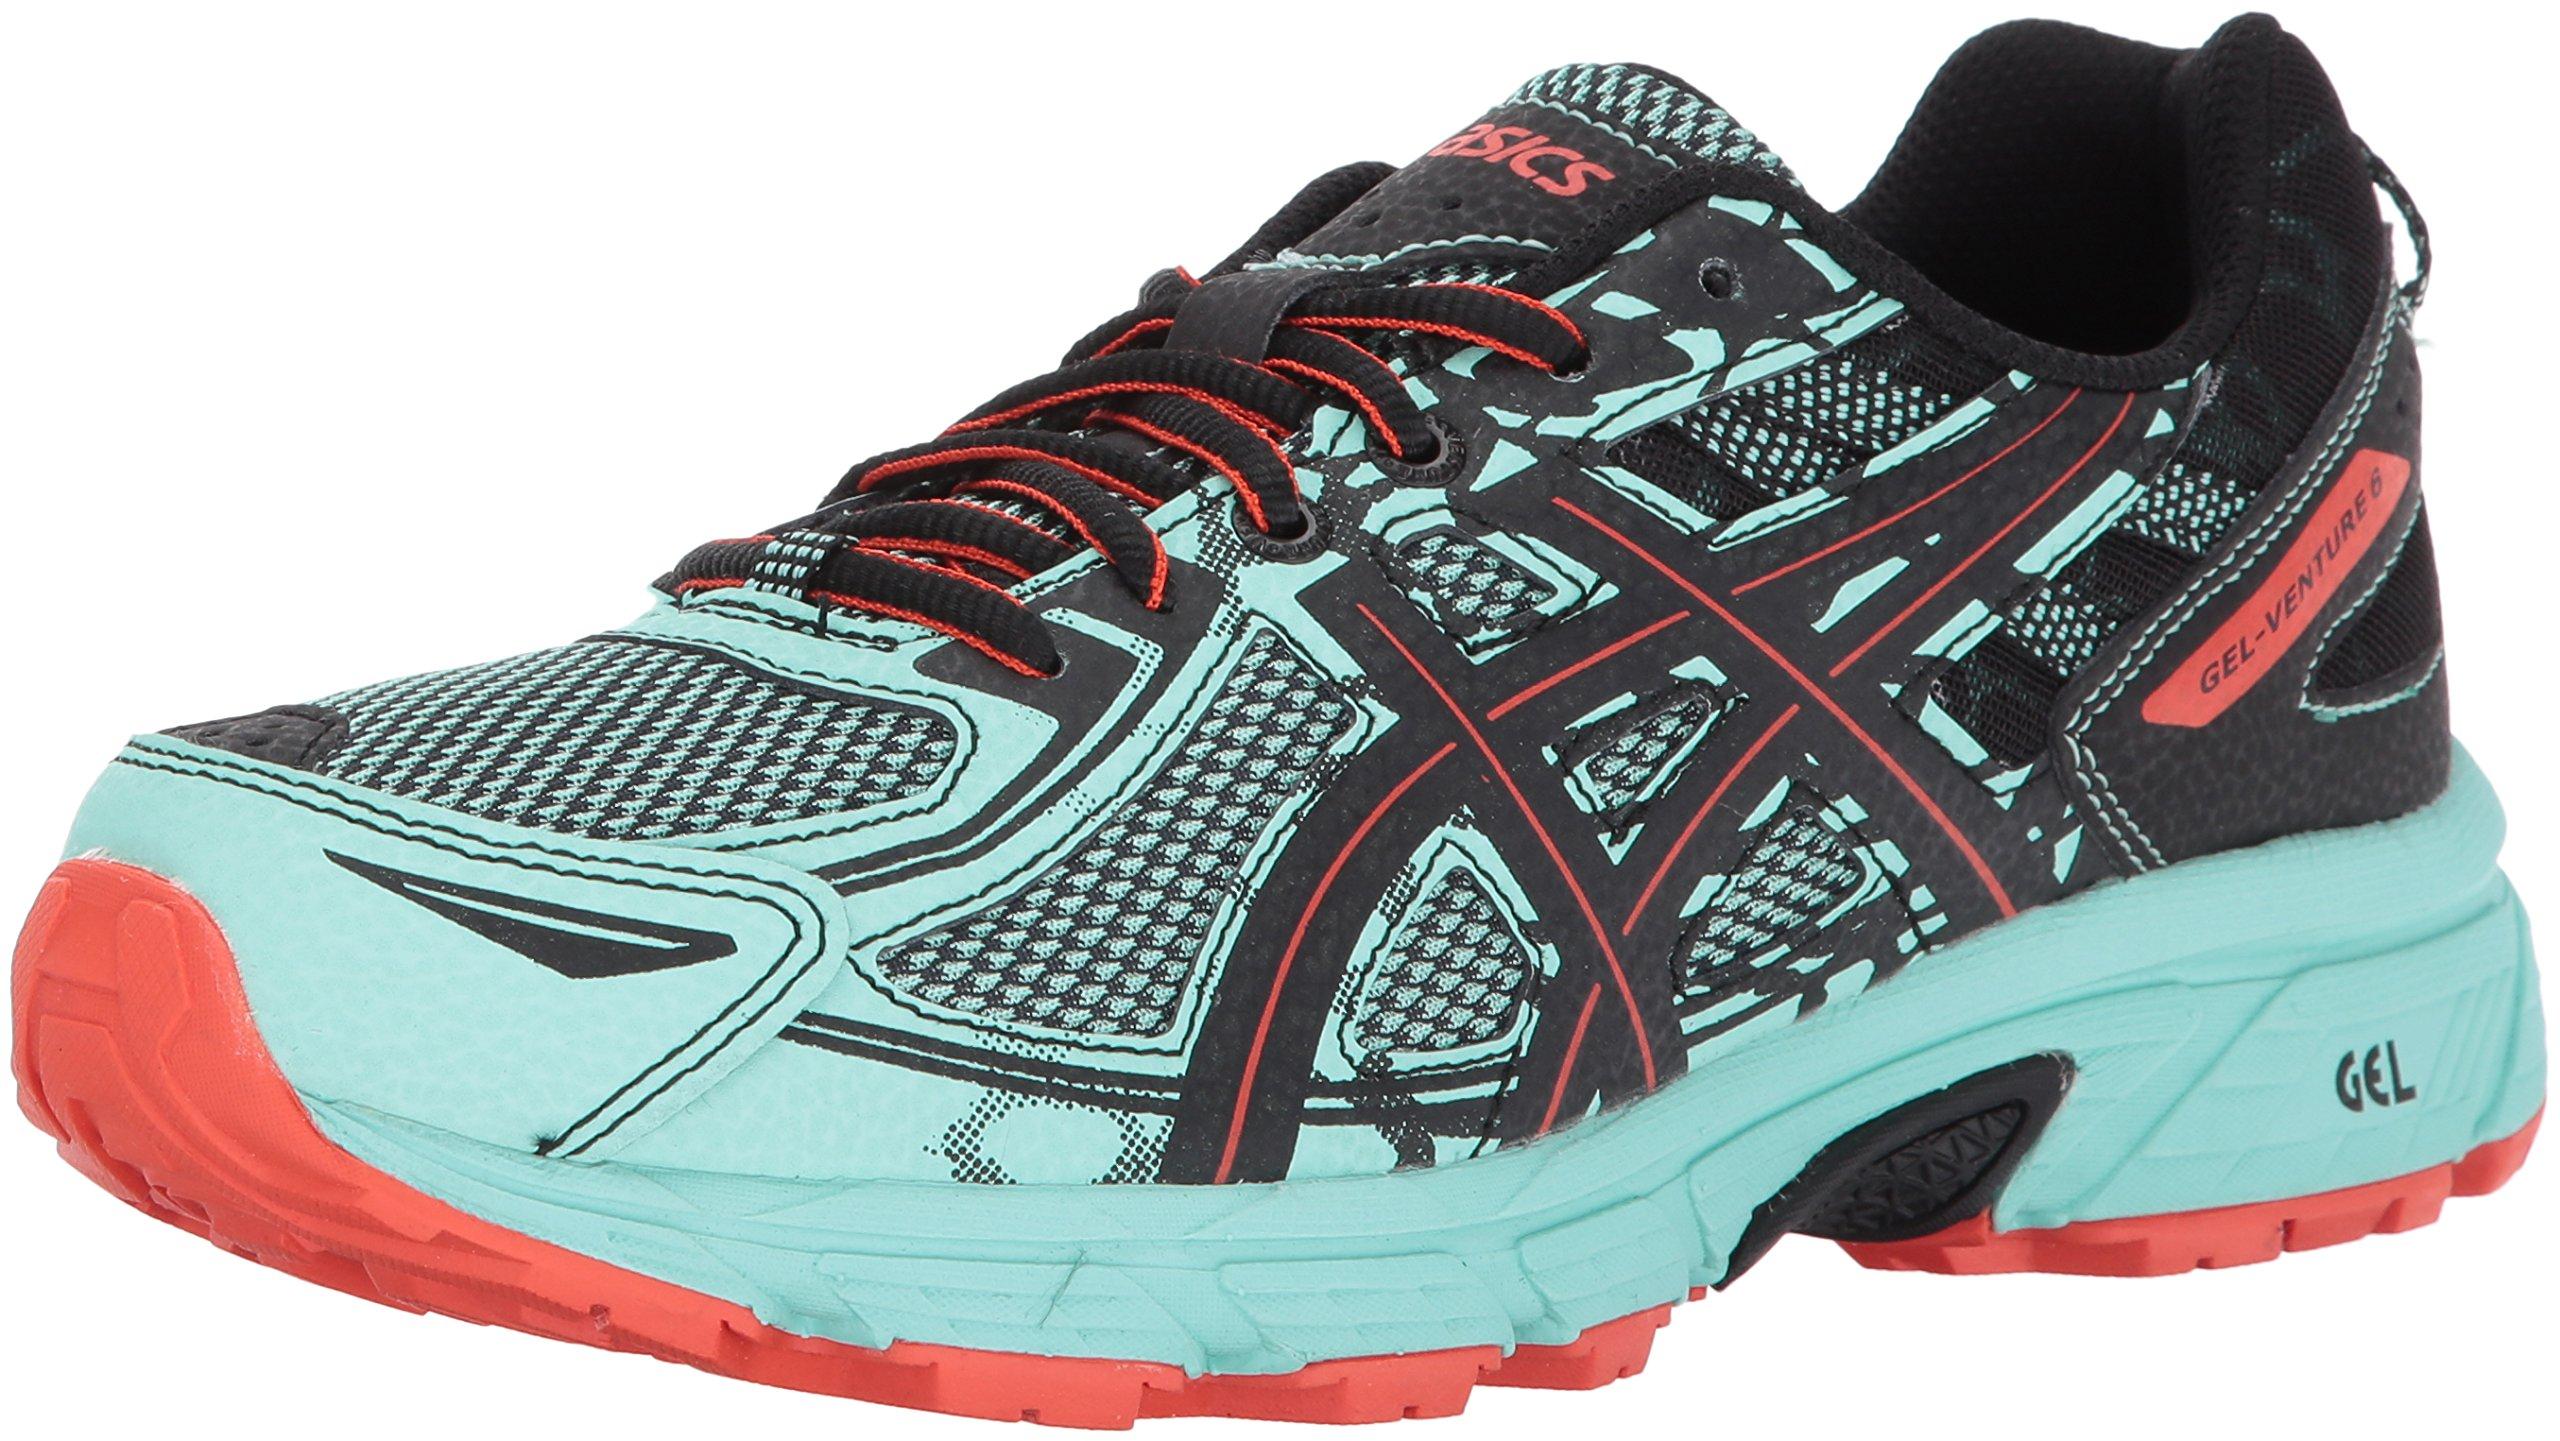 ASICS Women's Gel-Venture 6 Running-Shoes,Ice Green/Black/Cherry Tomato,11 Medium US by ASICS